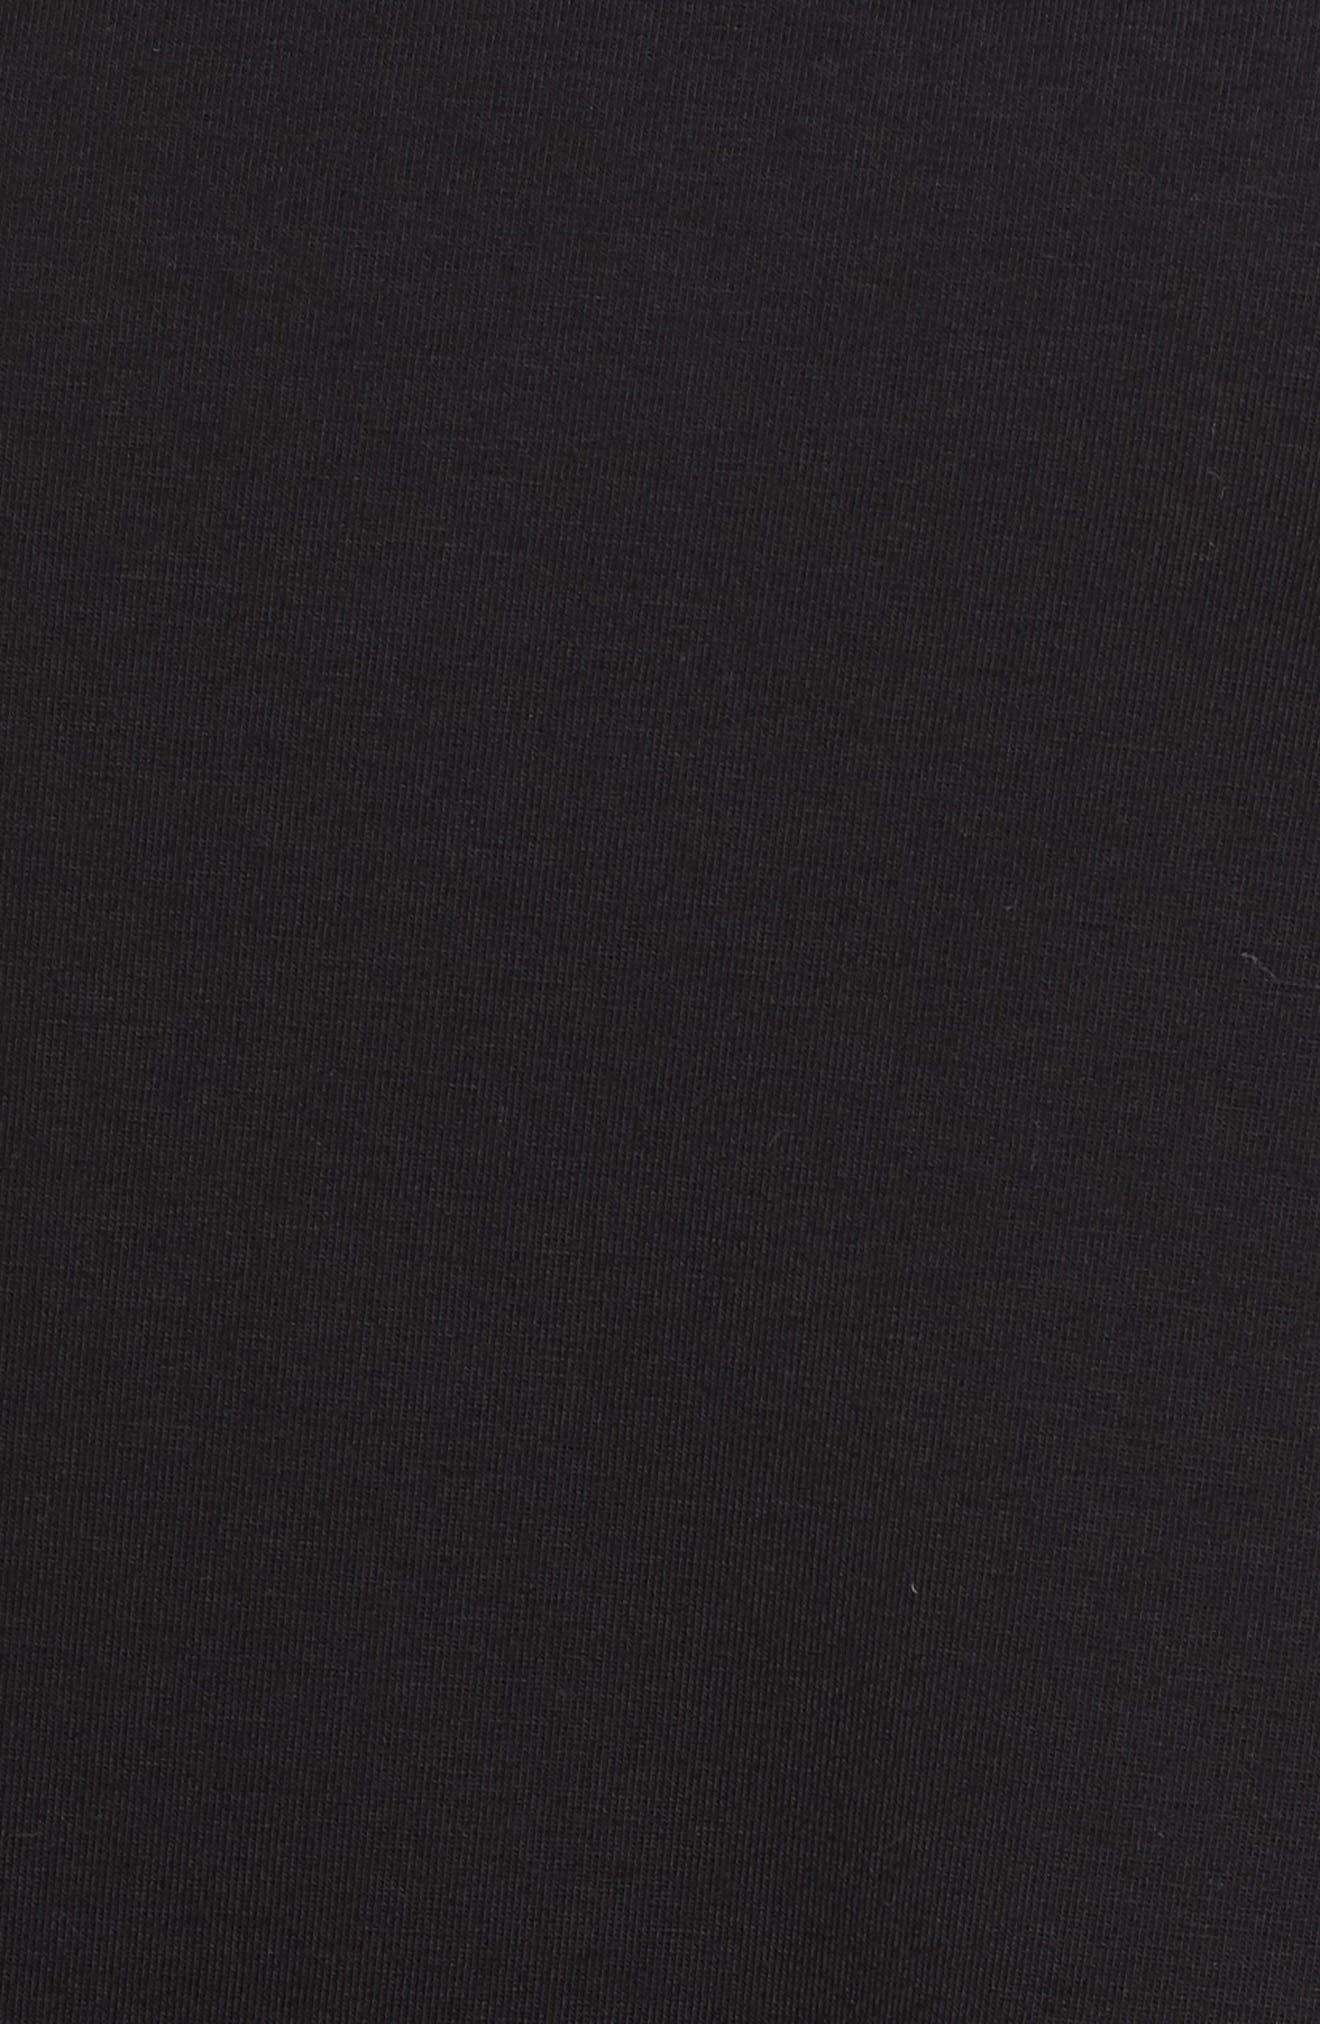 Stretch Organic Cotton Shift Dress,                             Alternate thumbnail 6, color,                             Black